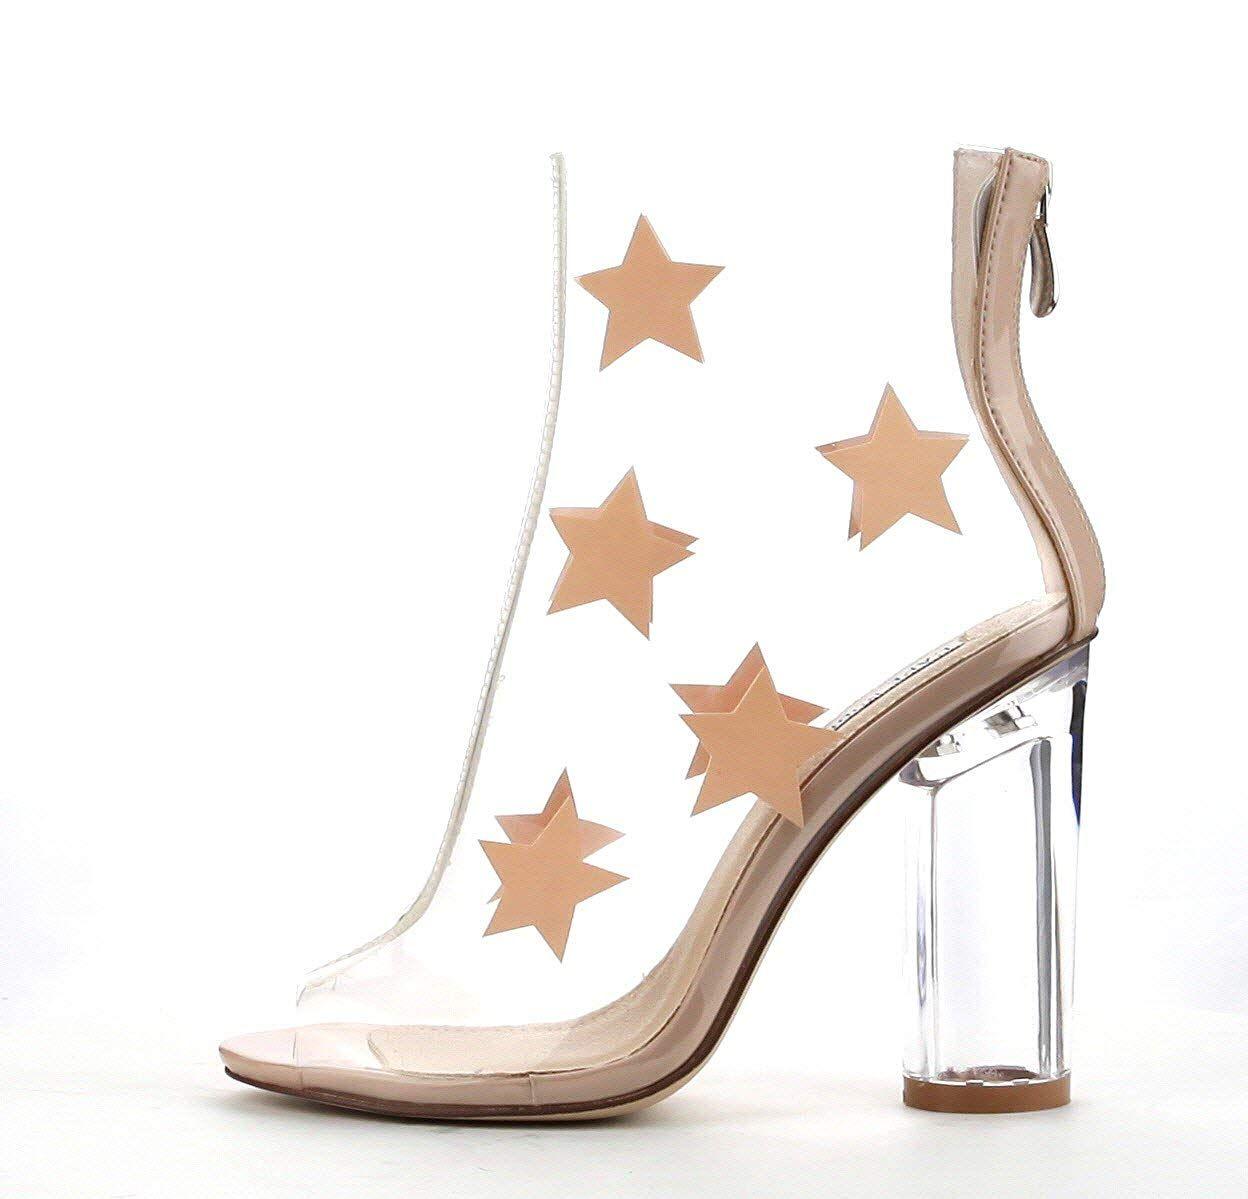 80ca4e329ef Cape Robbin GRACY-2 Womens Clear Lucite Perspex Stars Open Toe Ankle ...